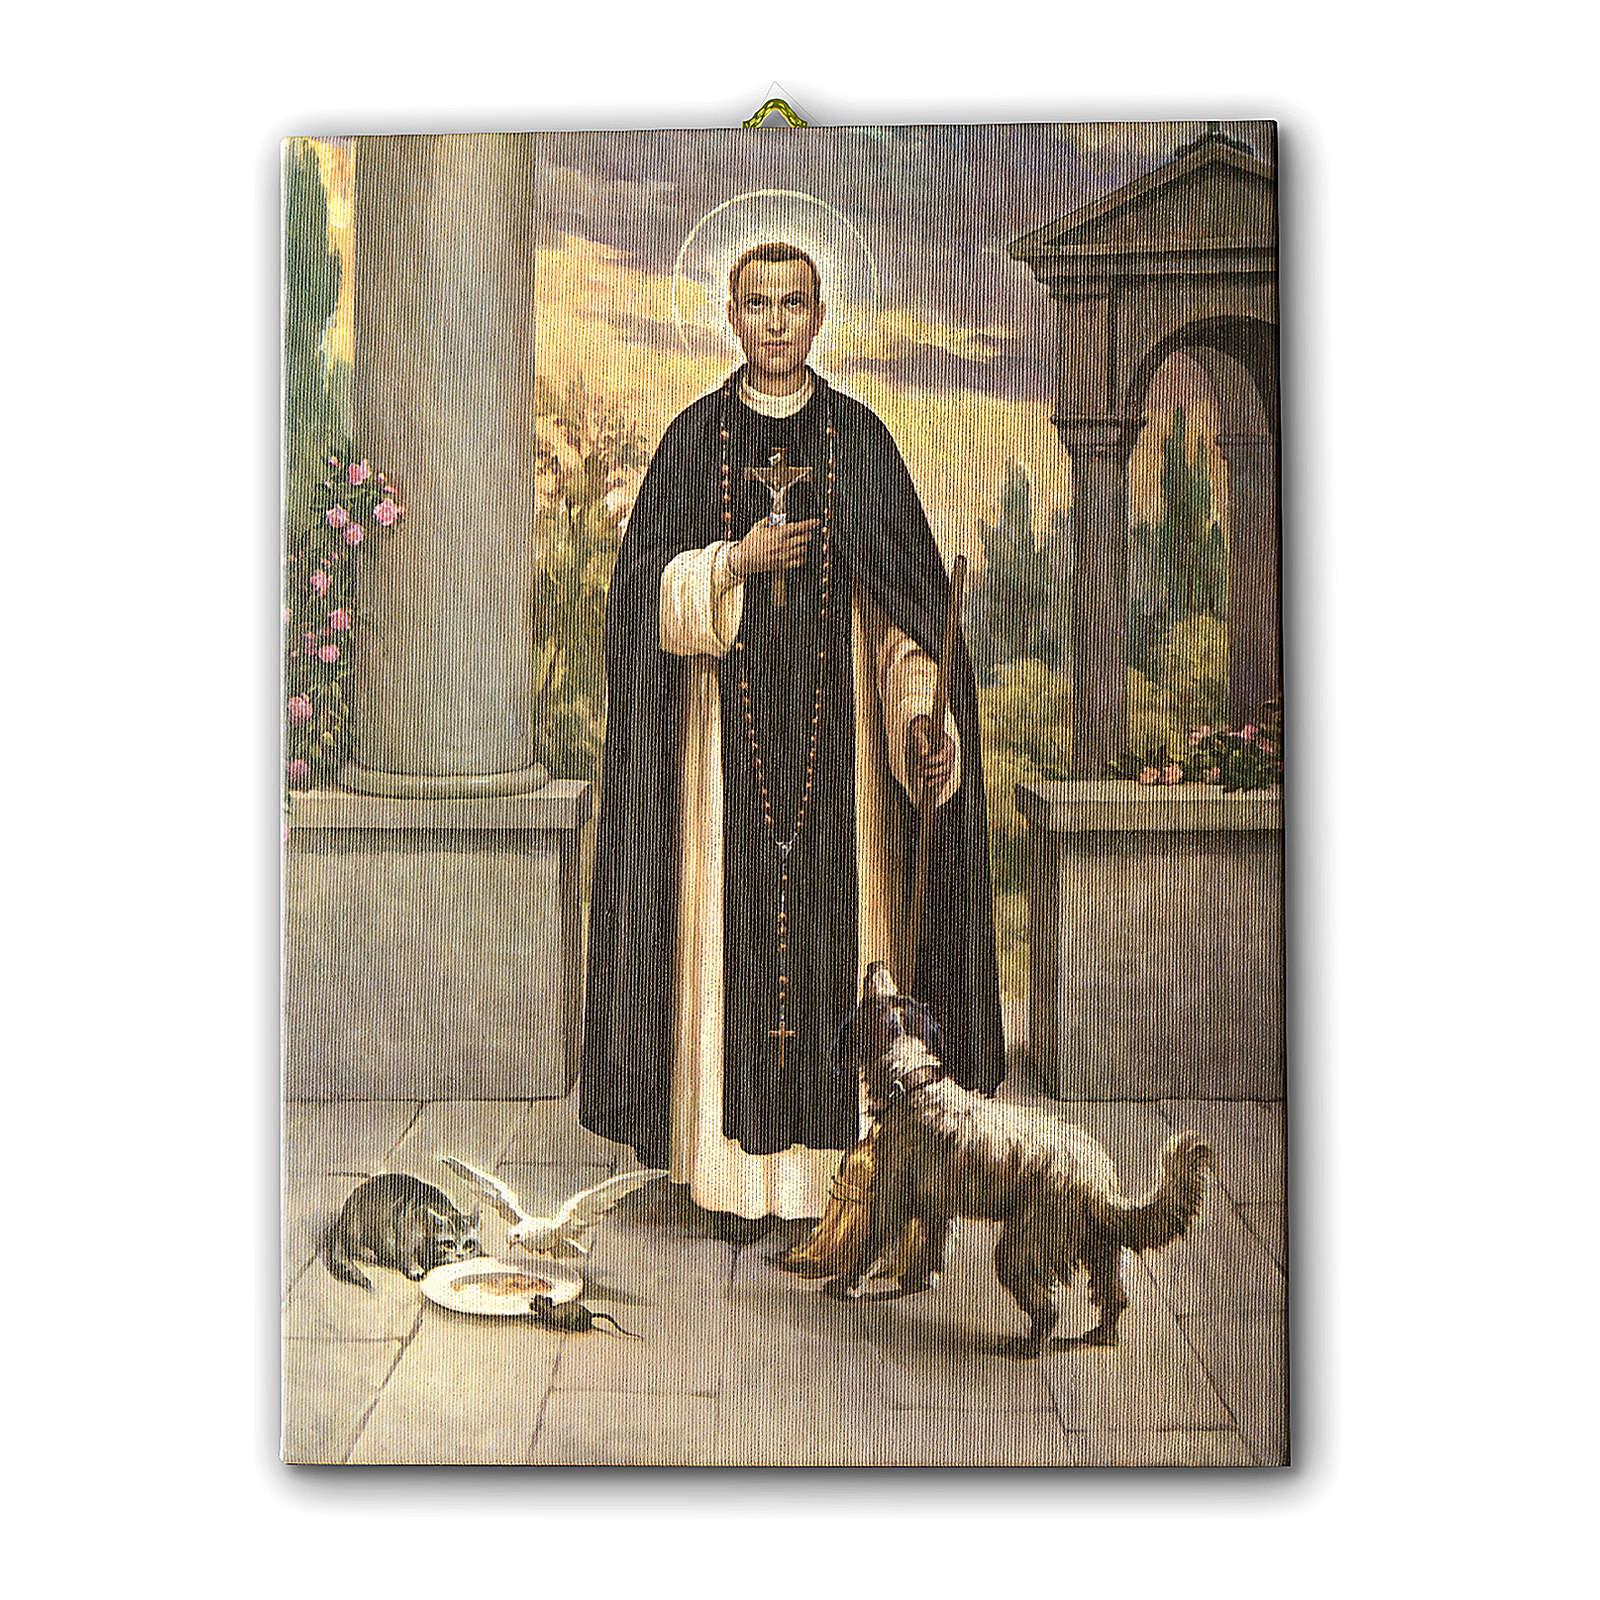 Quadro su tela pittorica San Martin de Porres 70x50 cm 3